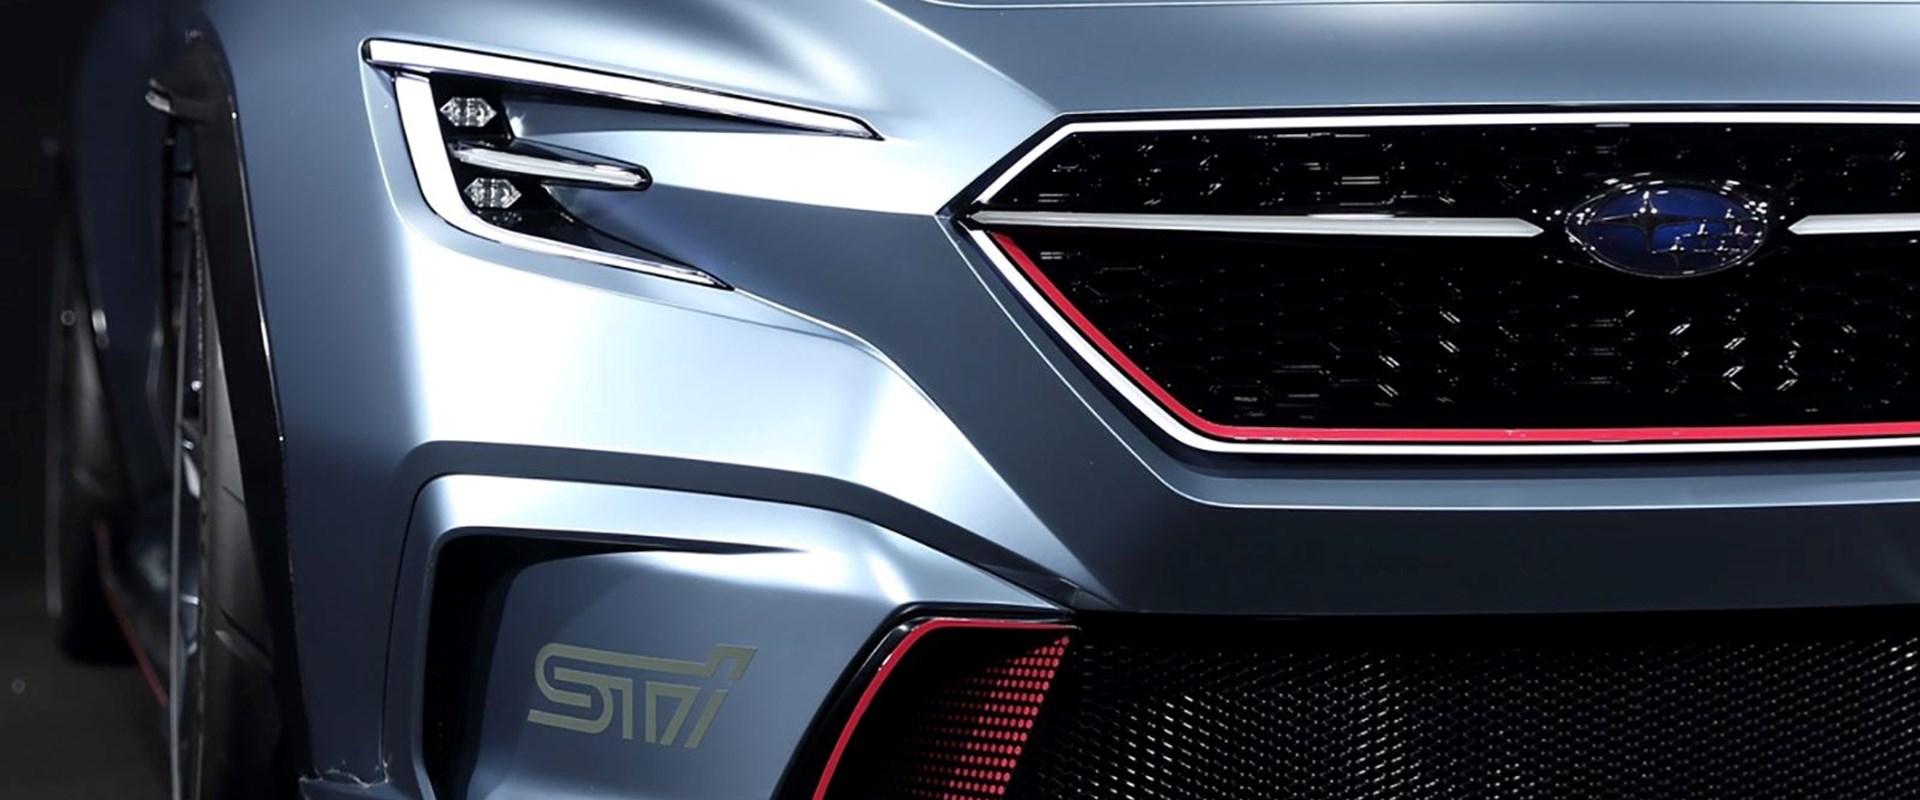 Subaruu0027s Latest Sports Car Concept Previews The New WRX STI   CarBuzz